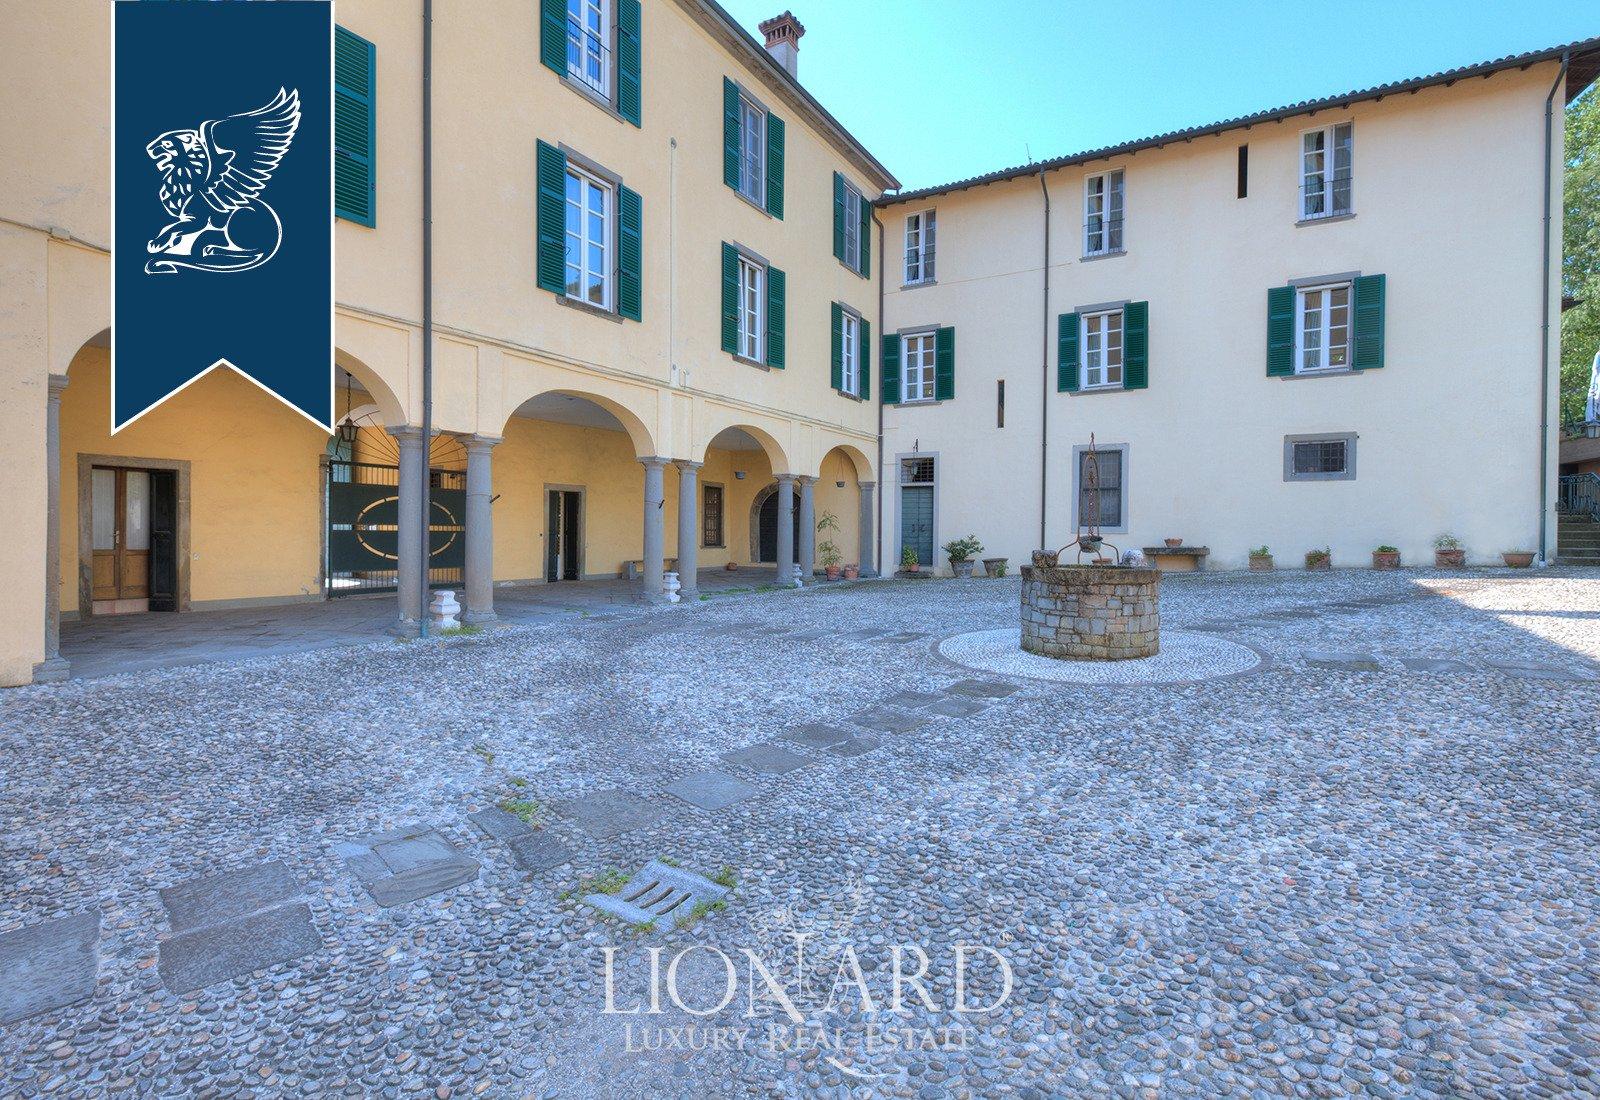 Villa in Paratico, Lombardy, Italy 1